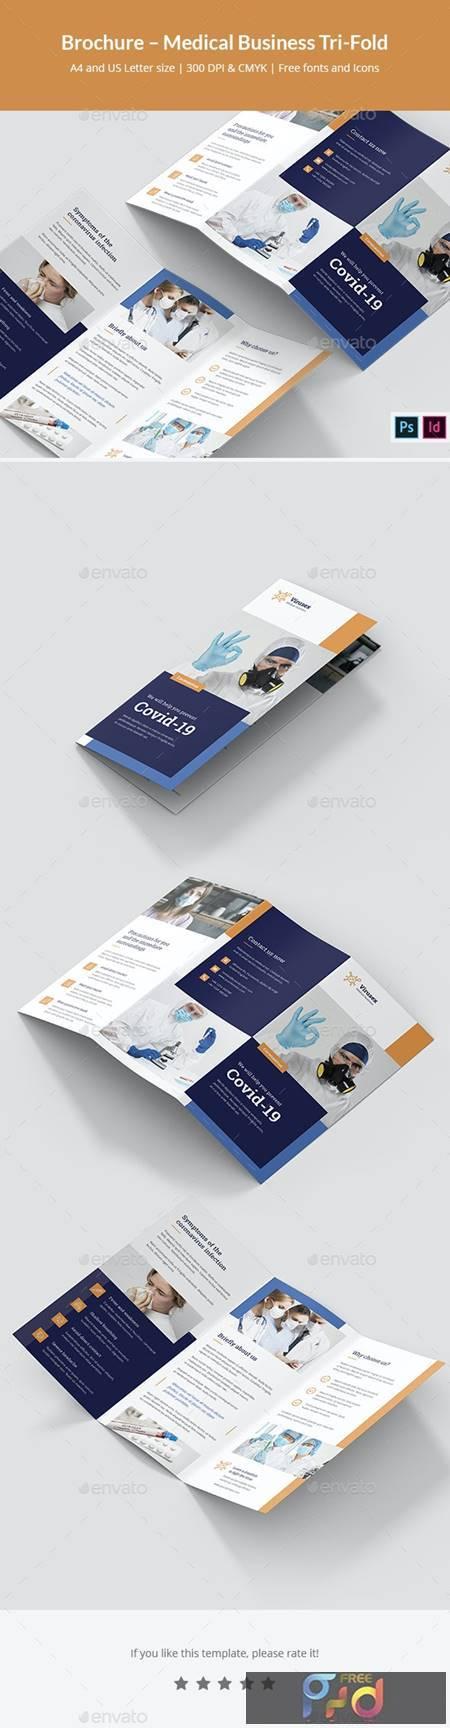 Brochure - Medical Business Tri-Fold 26132884 1